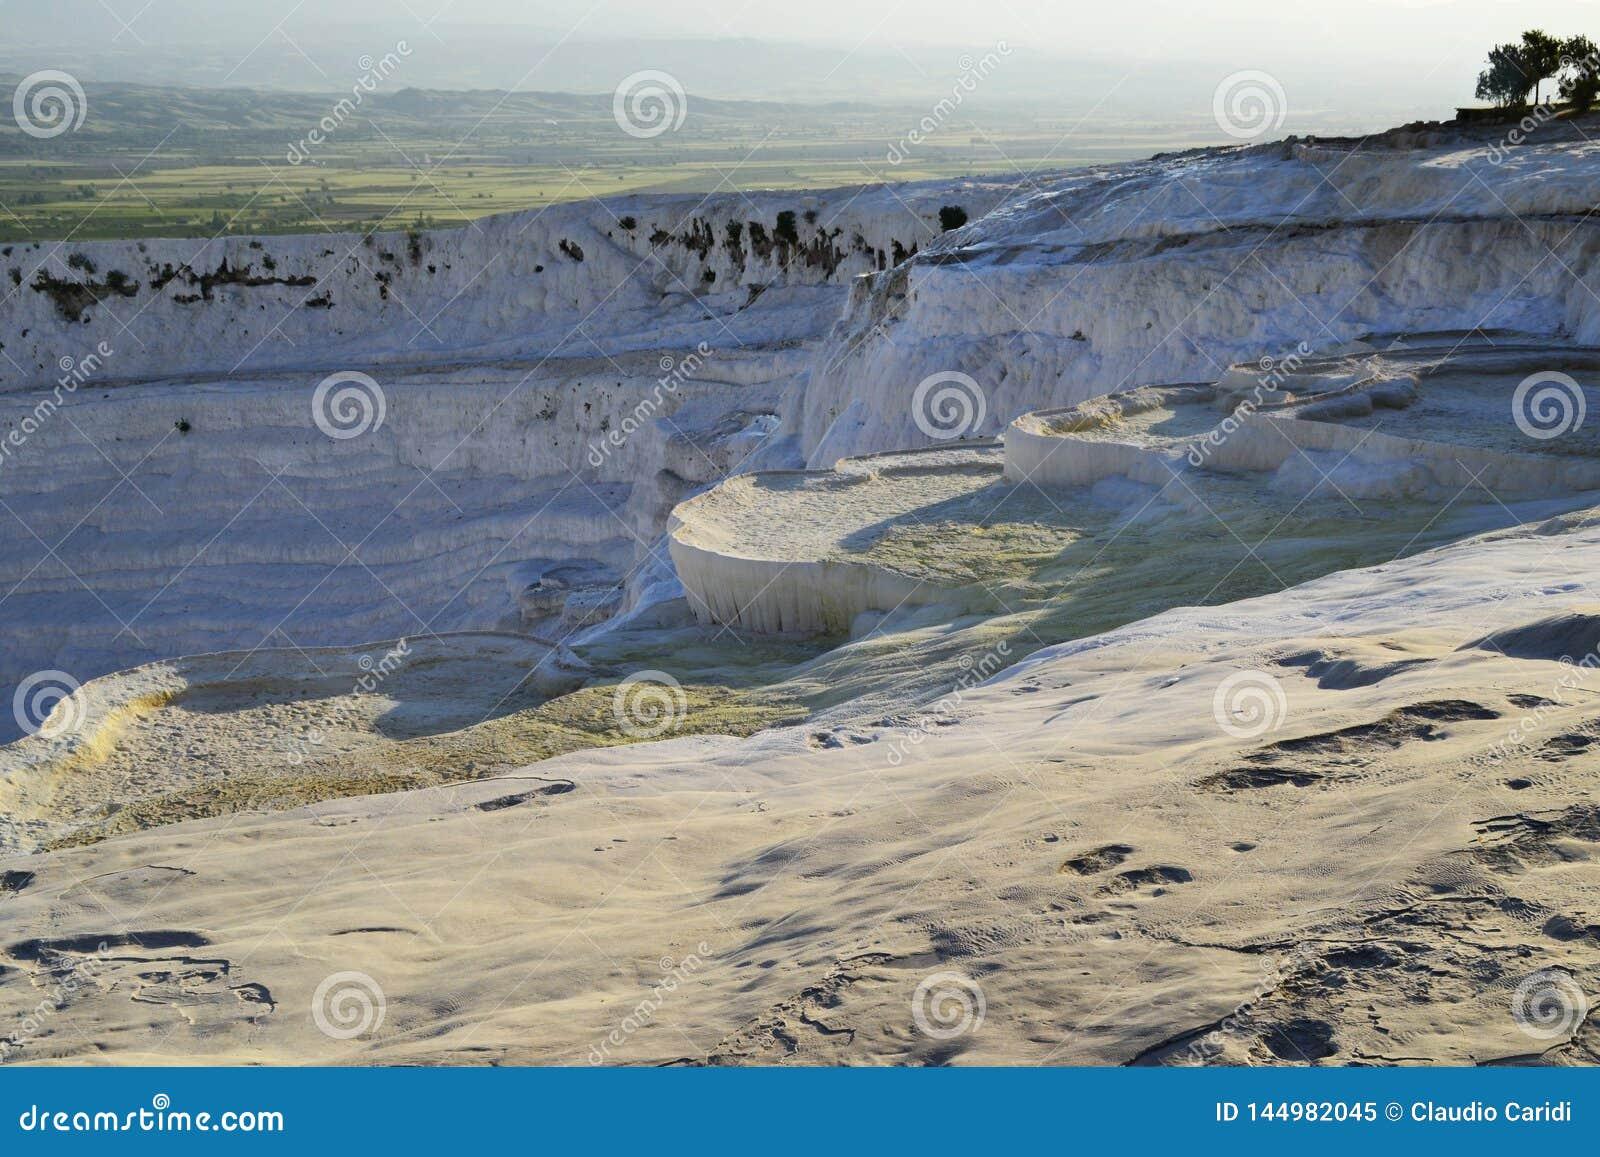 Piscines naturelles de travertin dans Pamukkale, Turquie